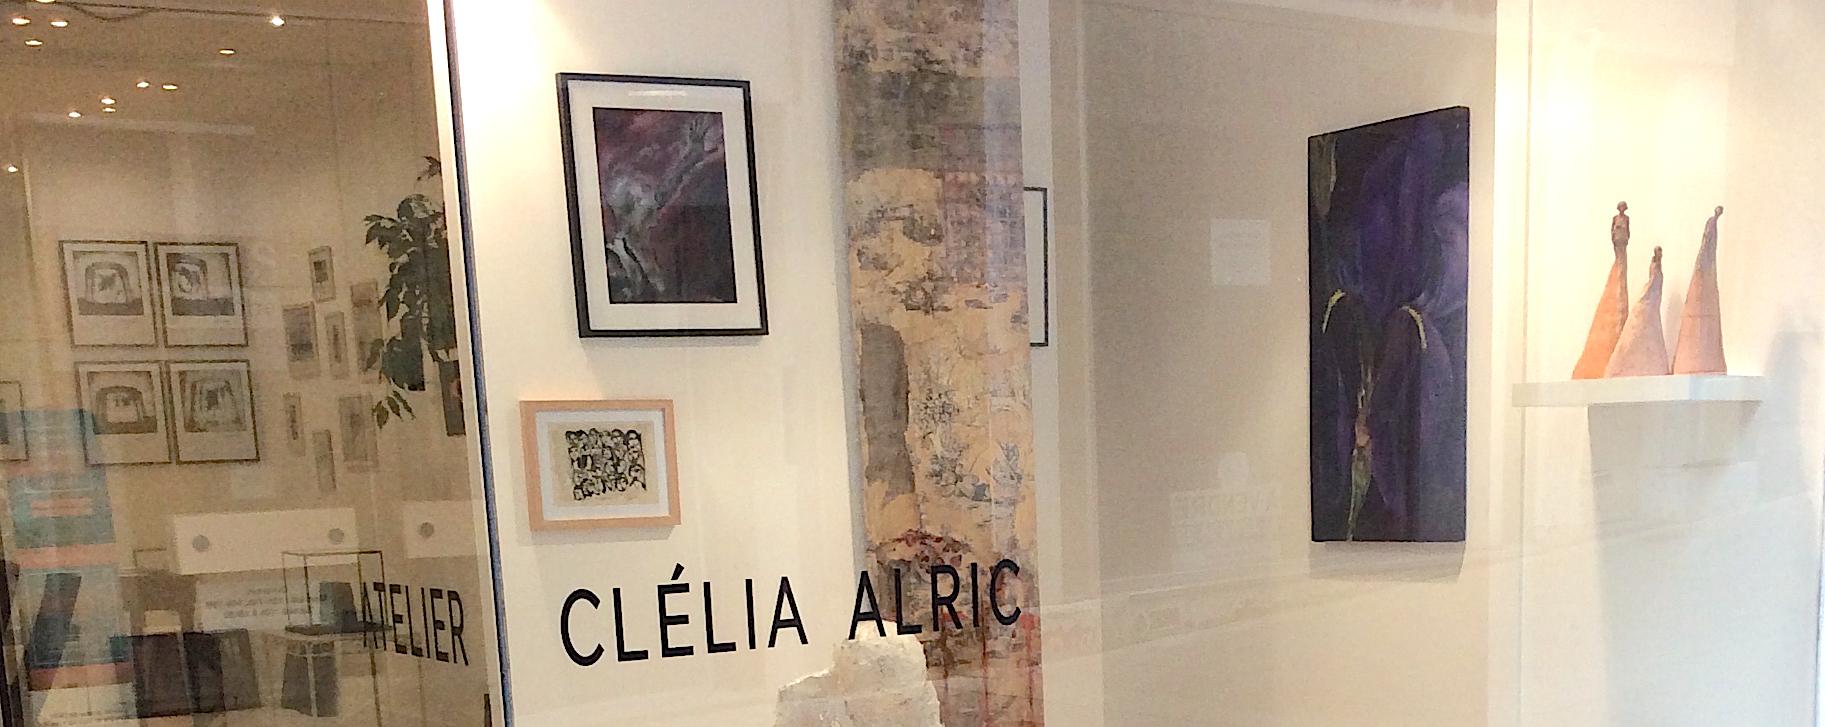 vitrine de l'Atelier Clélia Alricn à Niort